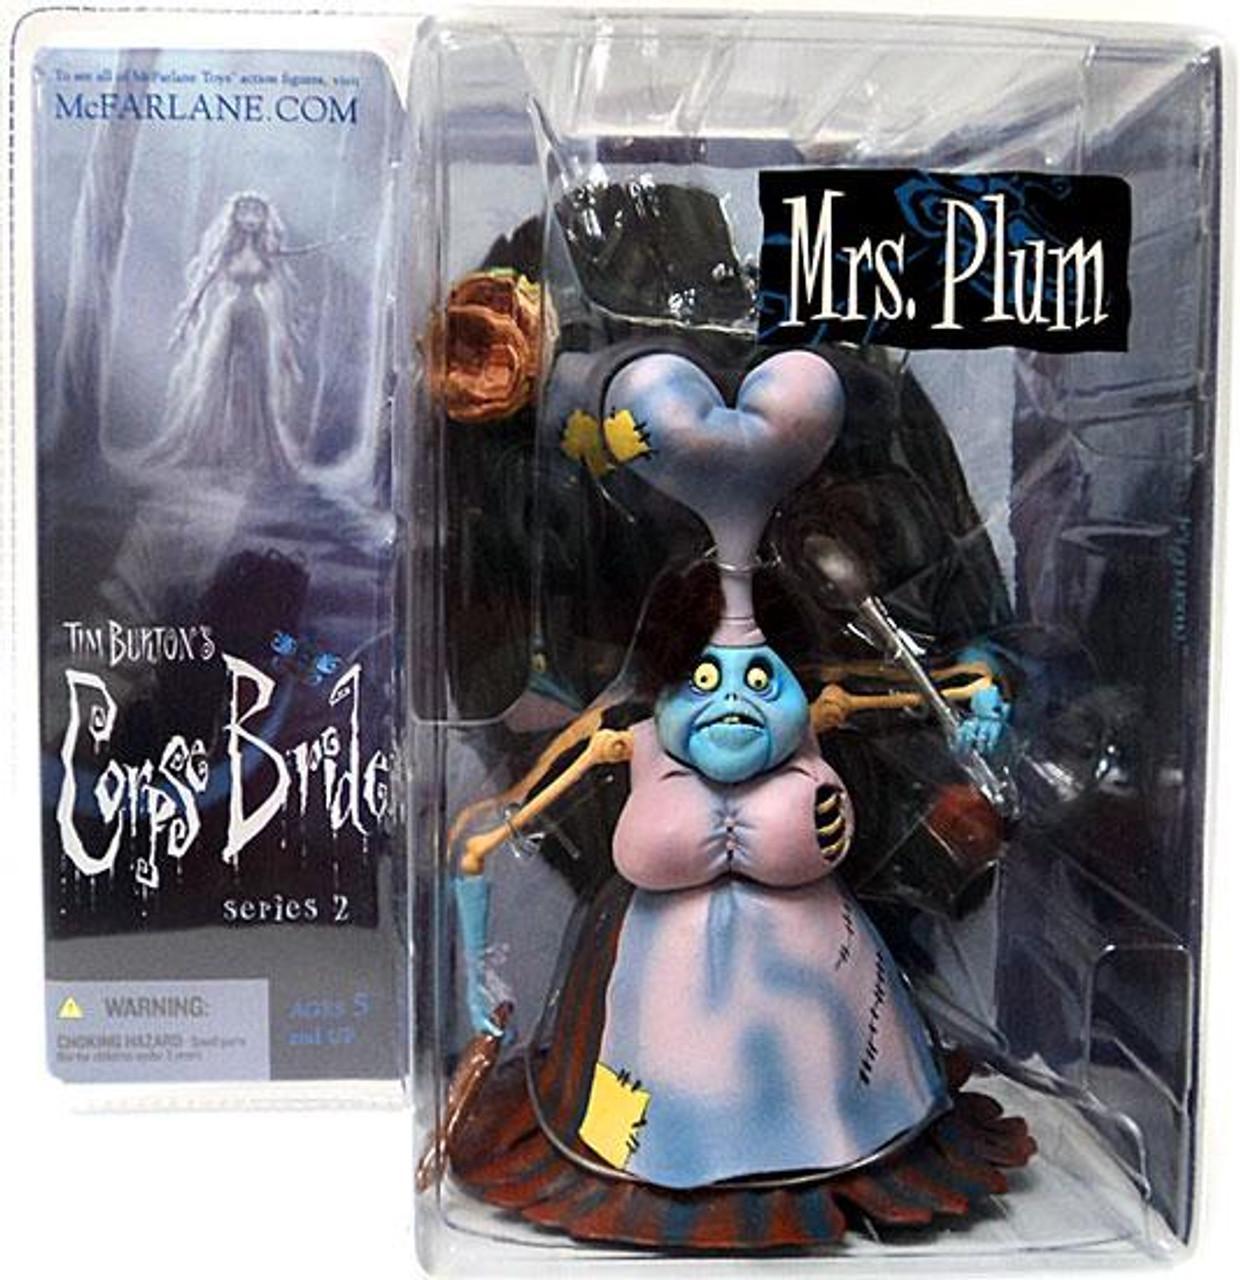 McFarlane Toys Corpse Bride Series 2 Mrs. Plum Action Figure